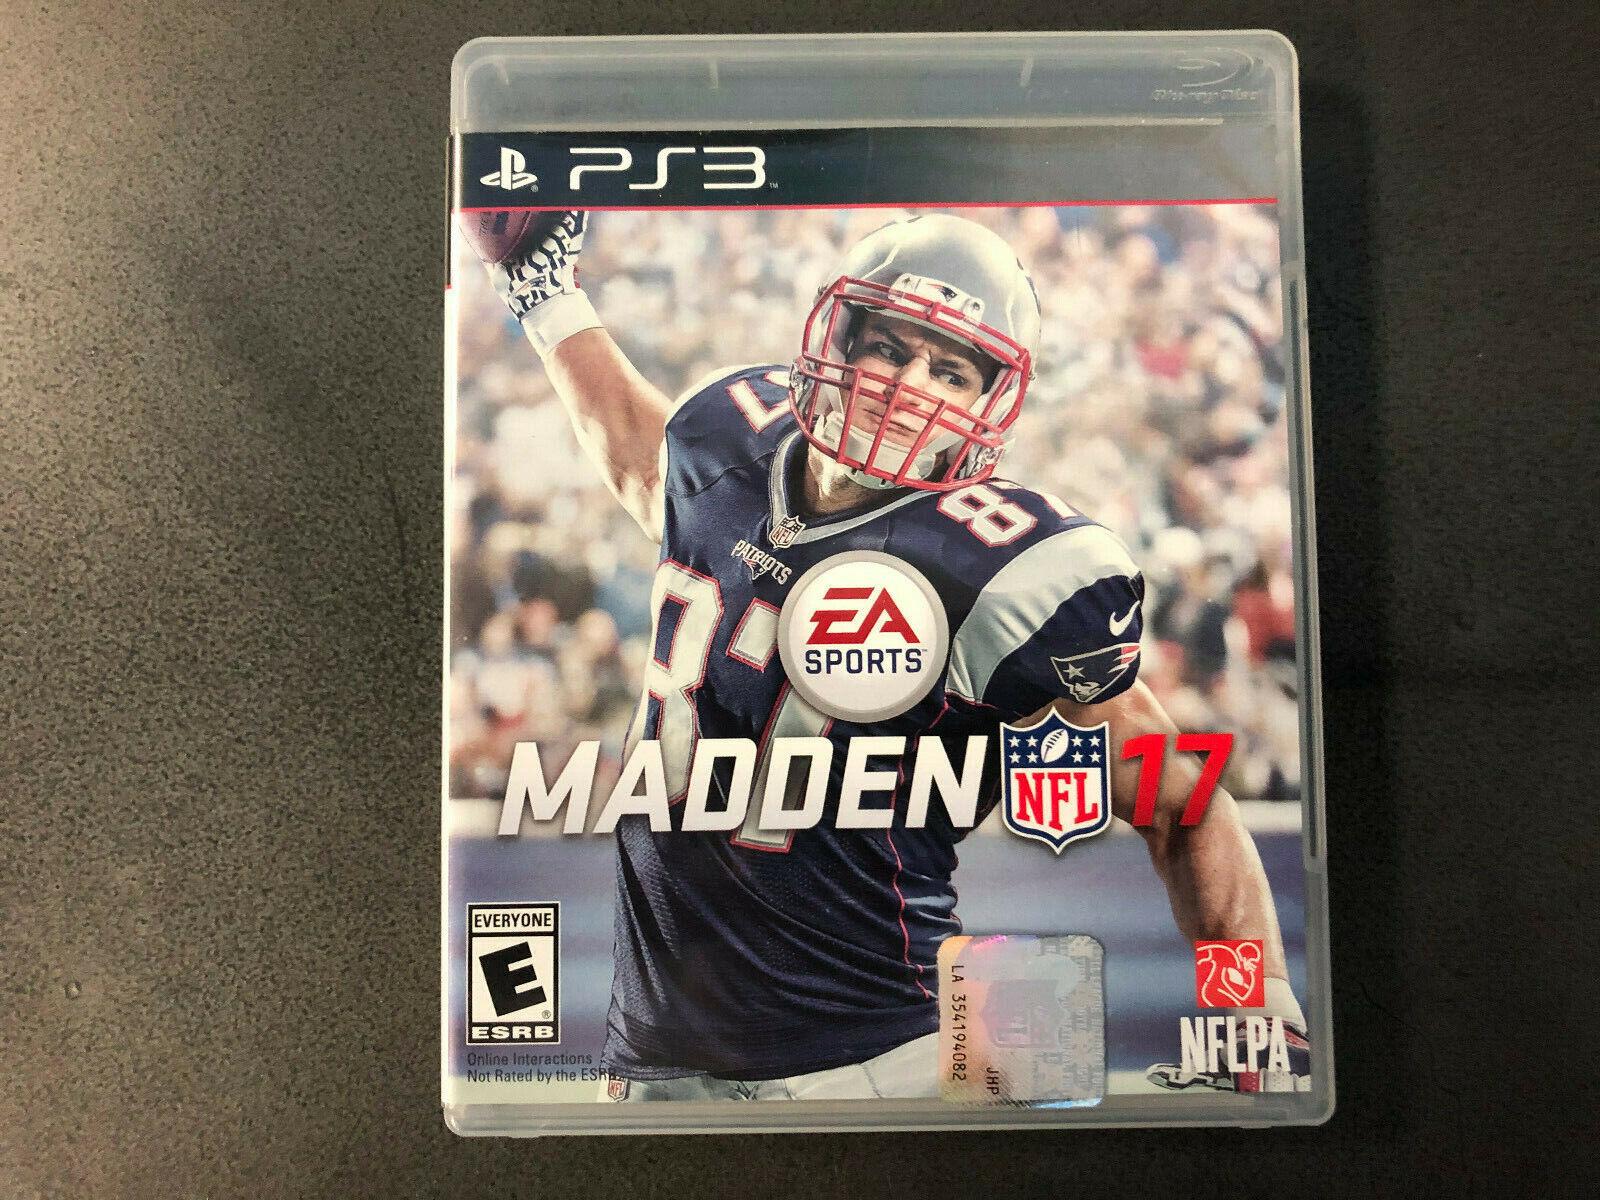 Madden NFL 17 Sony PlayStation 3 PS3, 2016 Black Label CIB RARE Tested  - $22.00